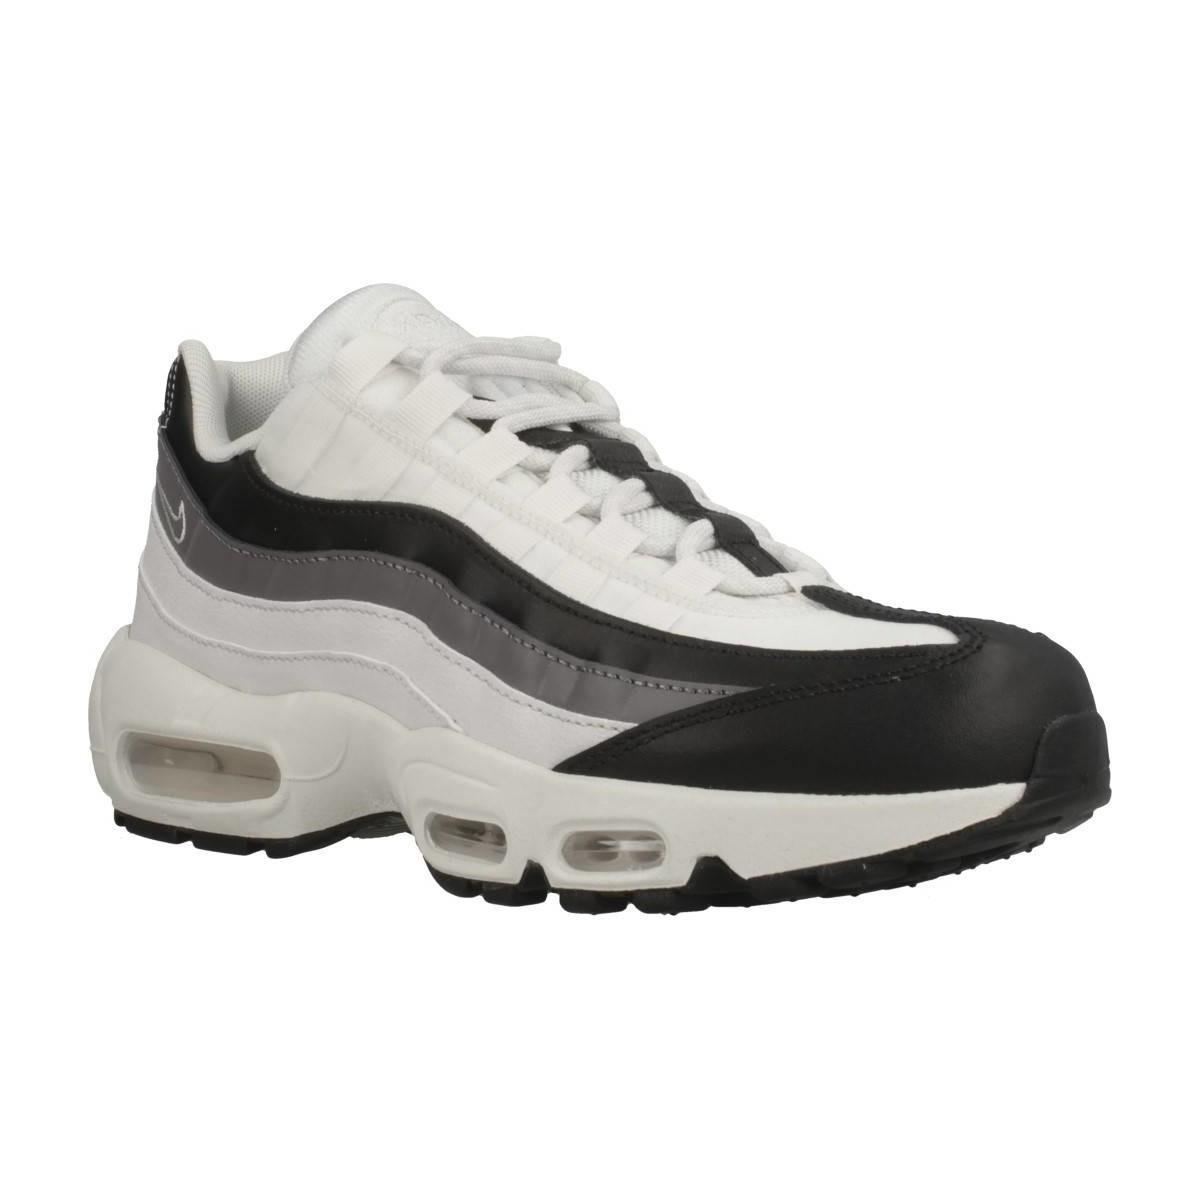 AIR MAX 95 femmes Chaussures en Beige Nike en coloris Neutre - Lyst